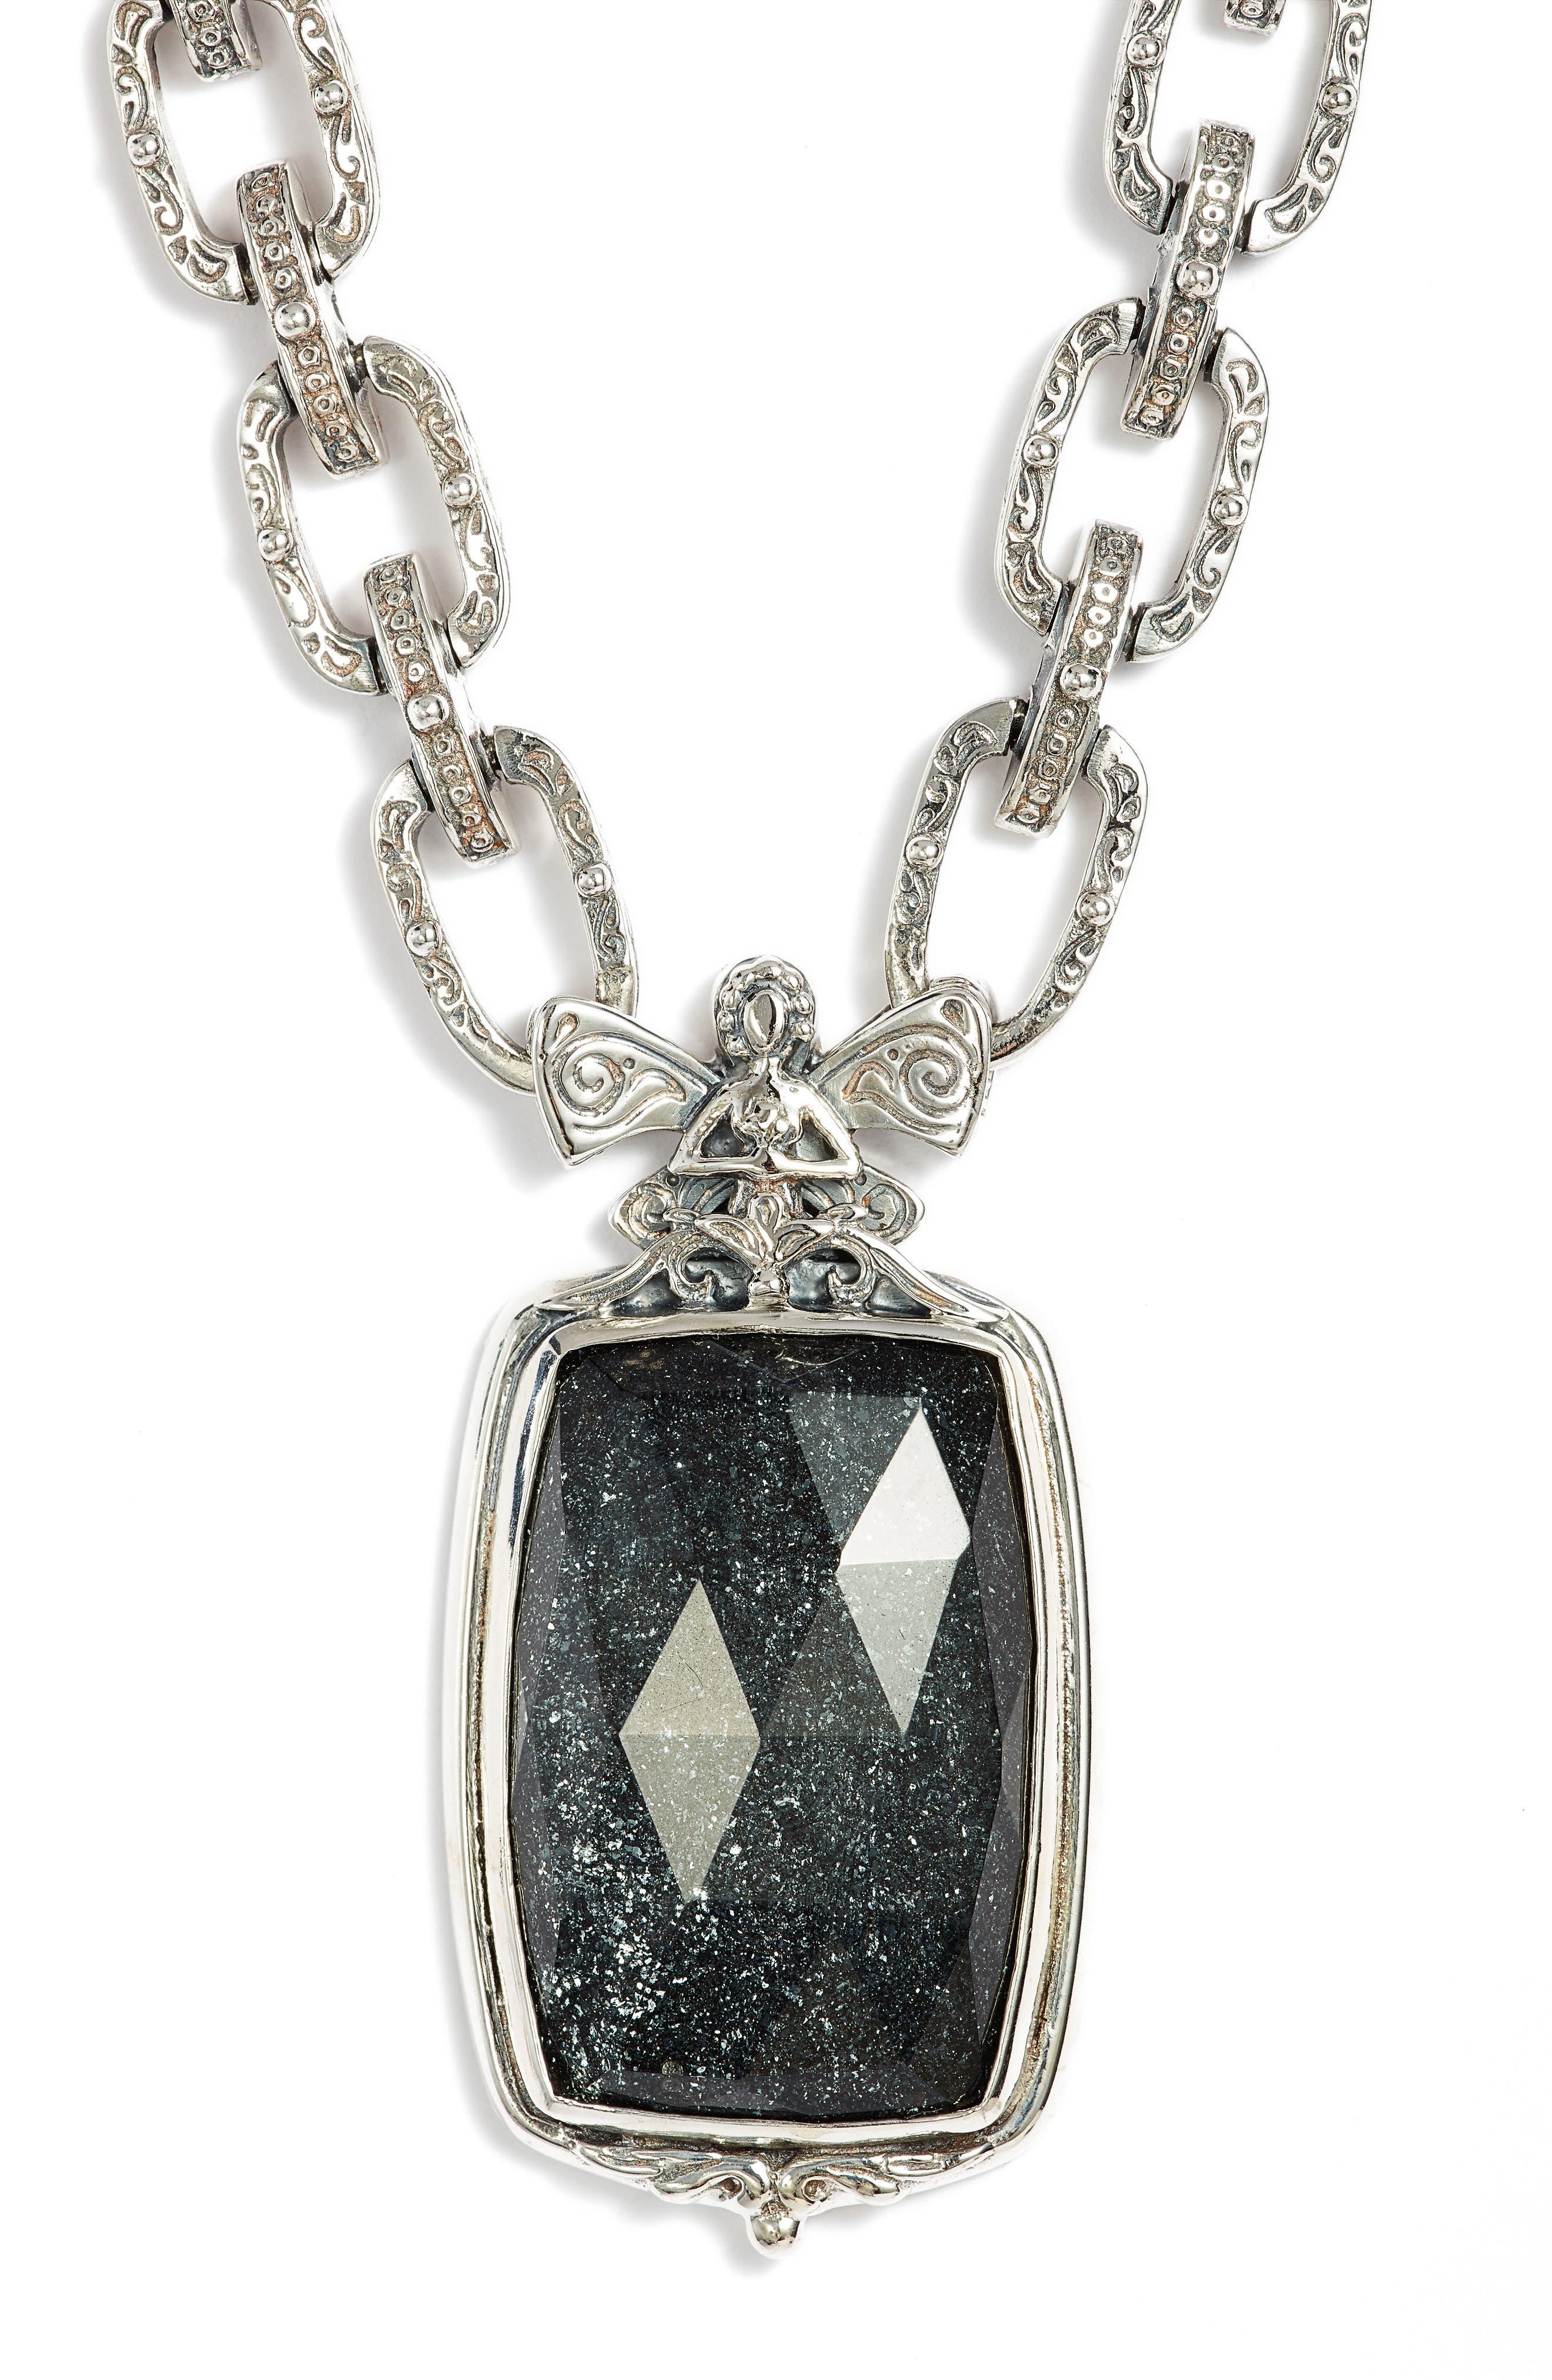 Santorini Hematite Pendant Necklace,                             Main thumbnail 1, color,                             Silver/ Hematite